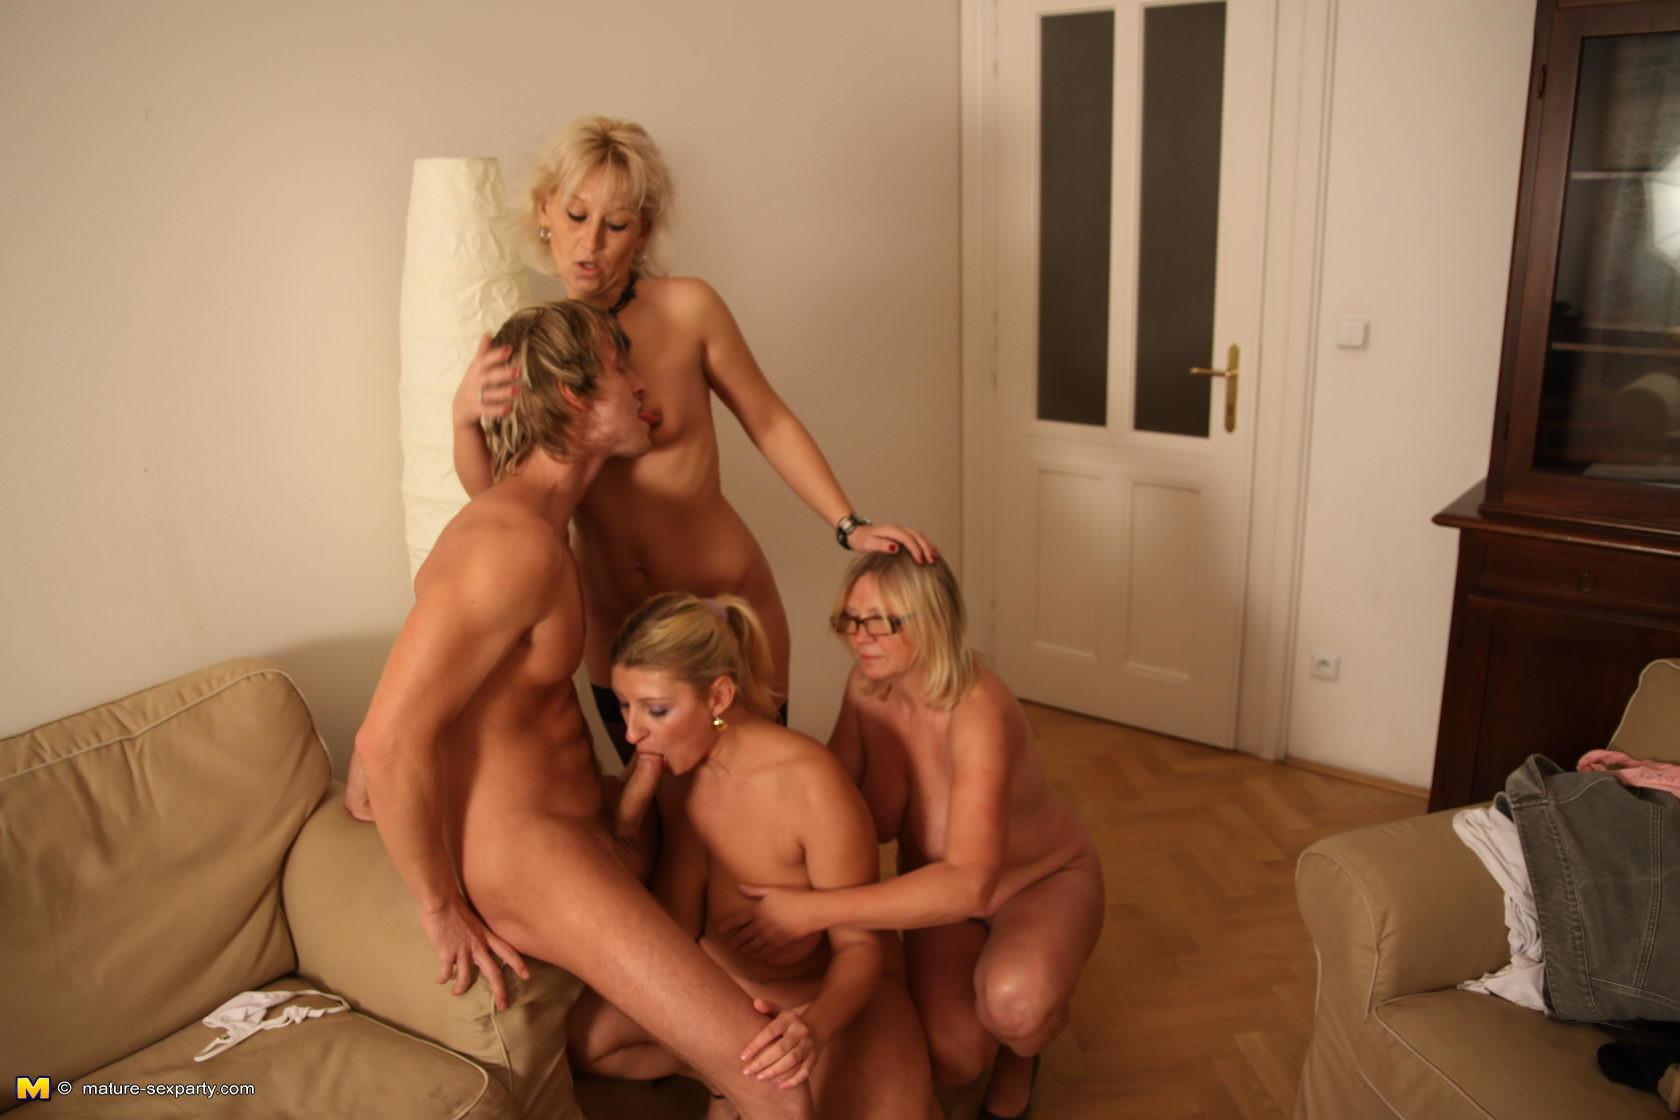 Old Women Threesome Pics